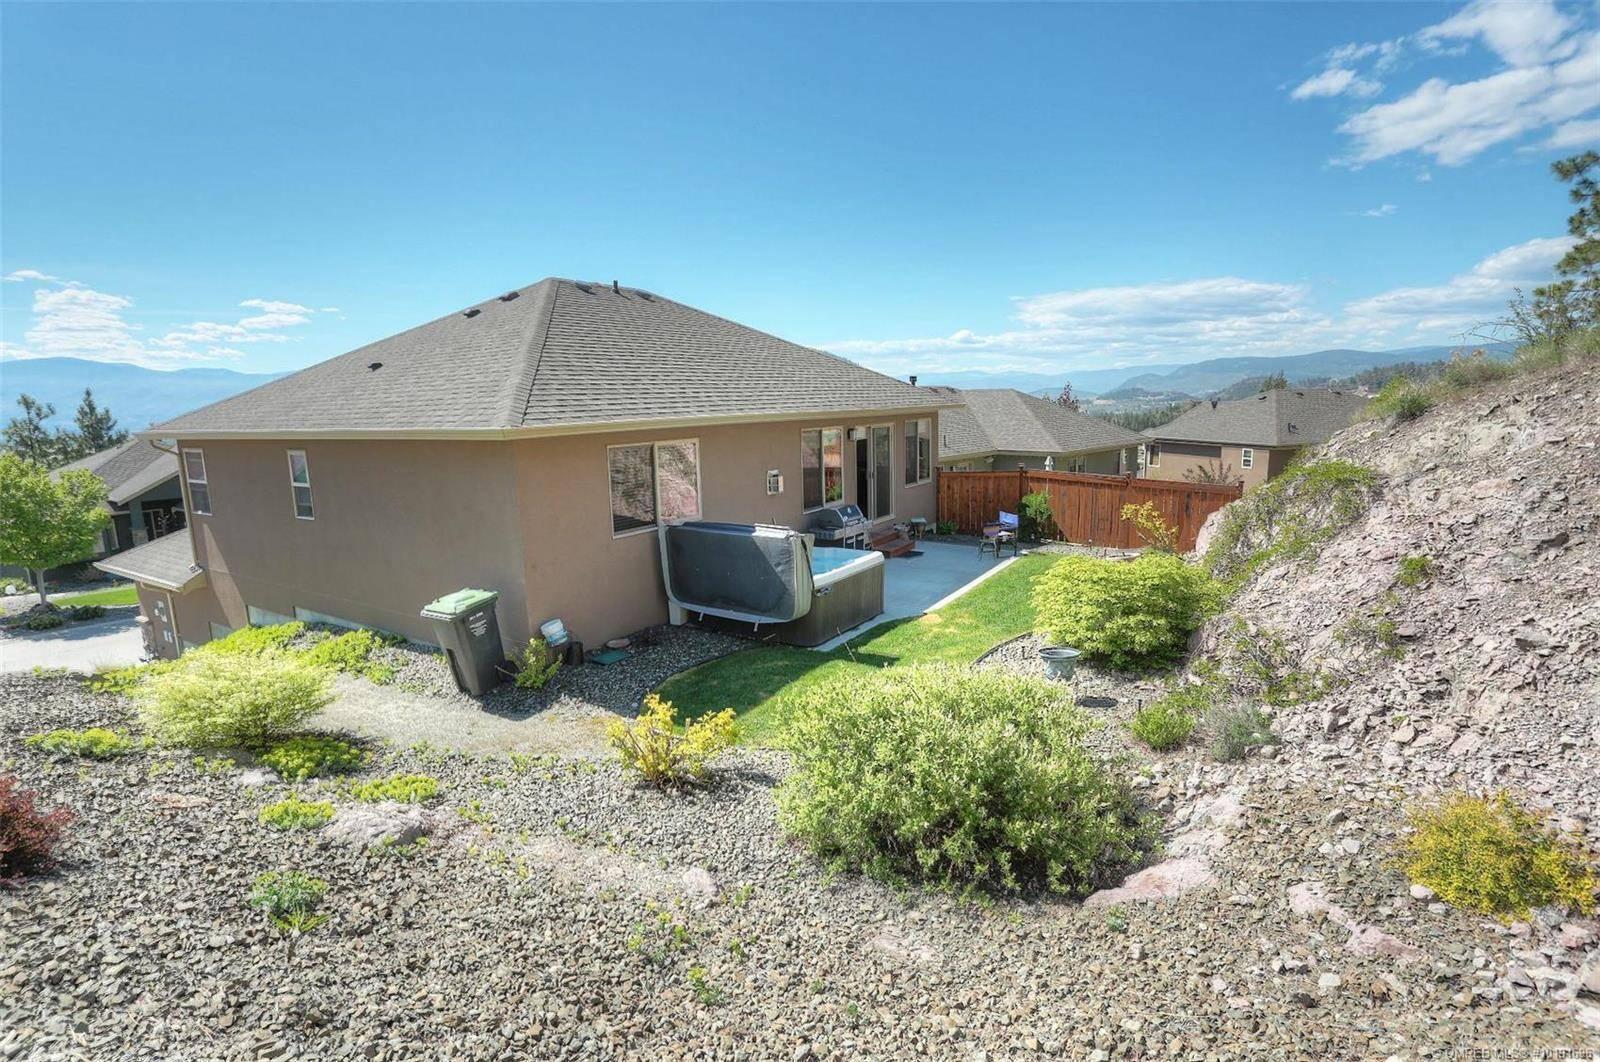 House for sale at 2040 Rosealee Ln Unit 32 West Kelowna British Columbia - MLS: 10191696